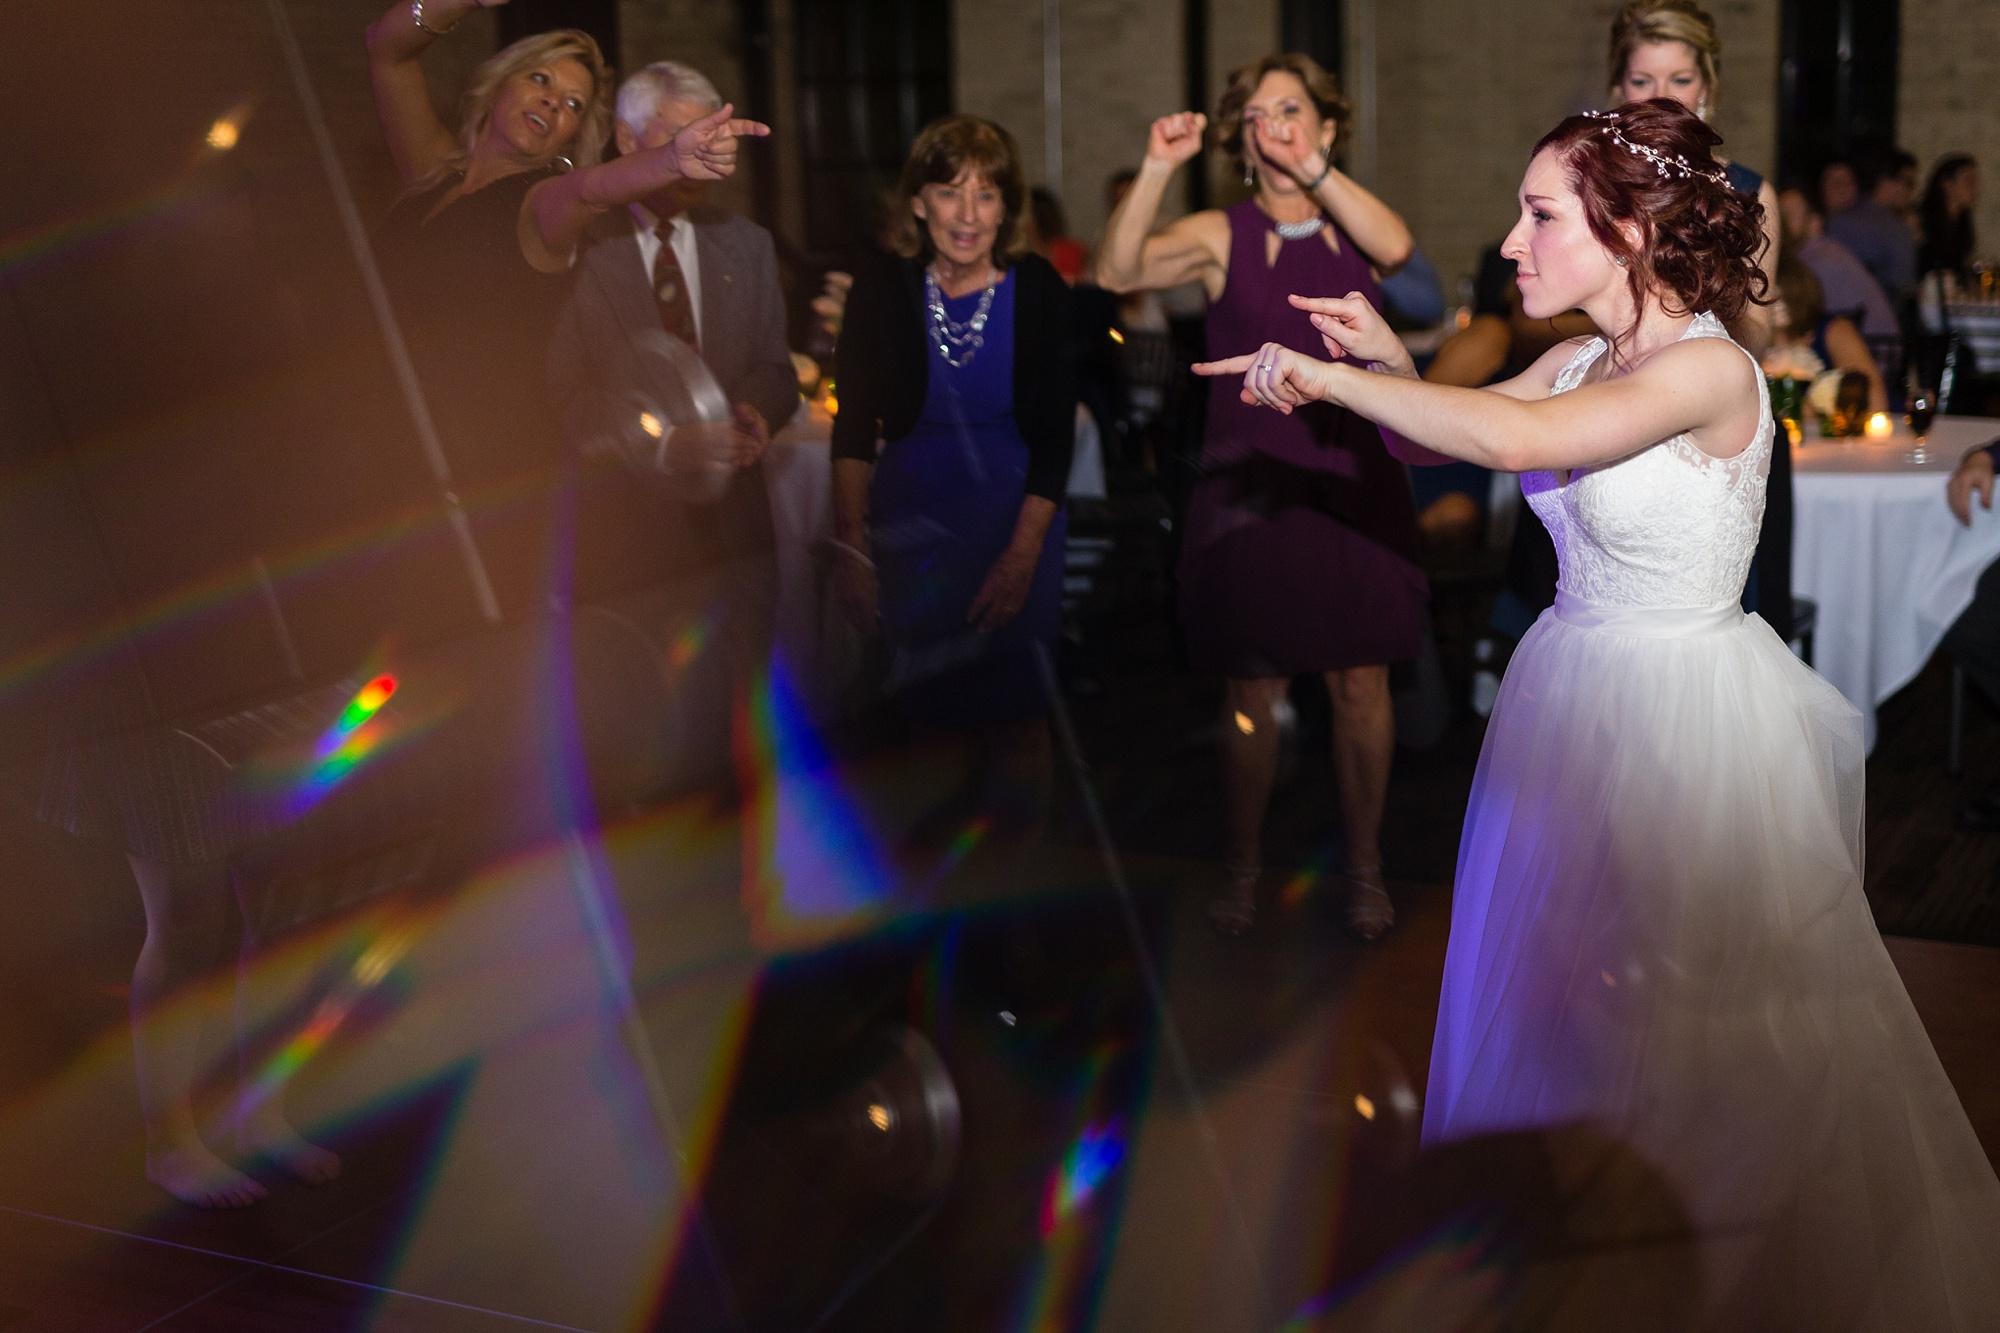 Brandon_Shafer_Photography_Lauren_Ethan_New_Vintage_Place_Grand_Rapids_Wedding_0056.jpg